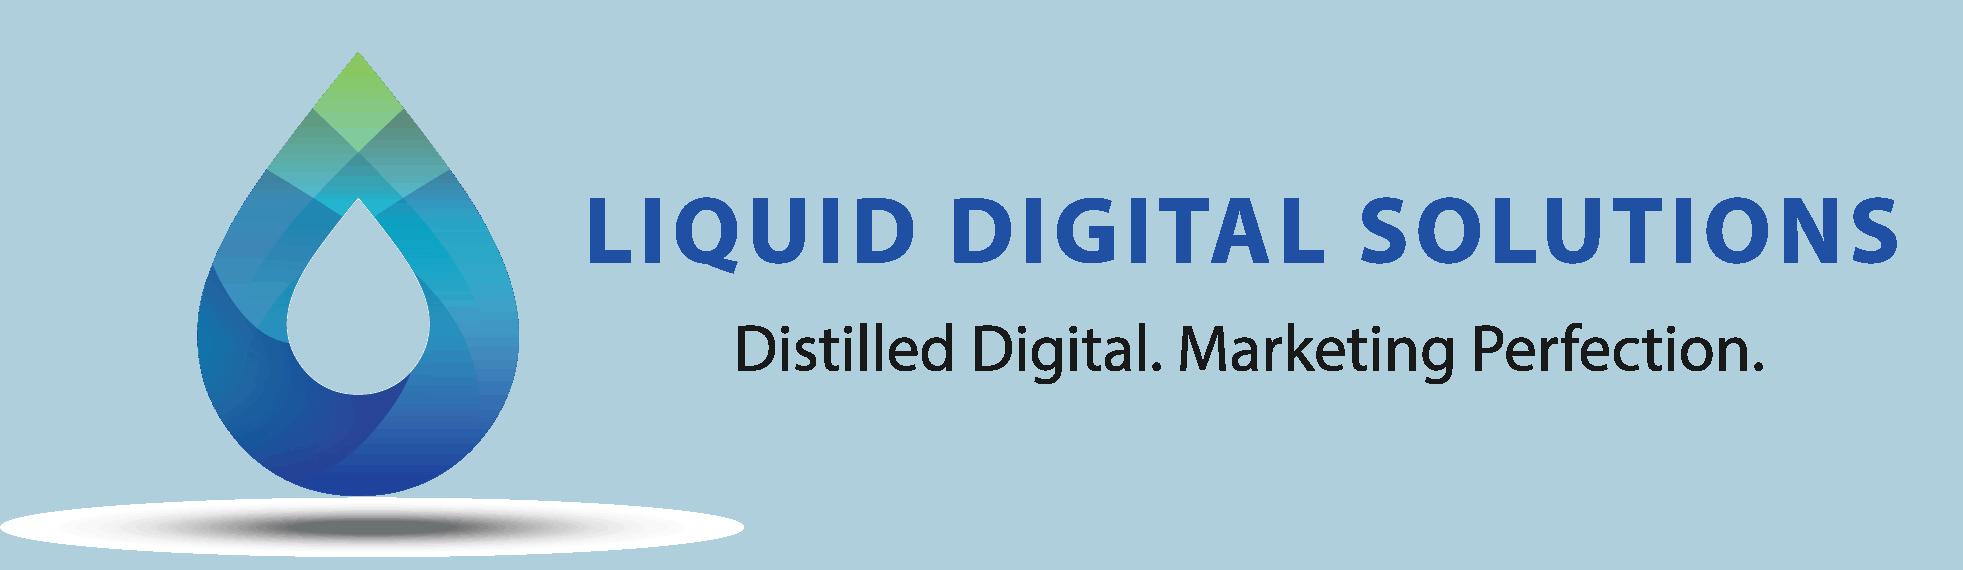 Liquid Digital Solutions. Distilled Digital. Marketing Perfection.